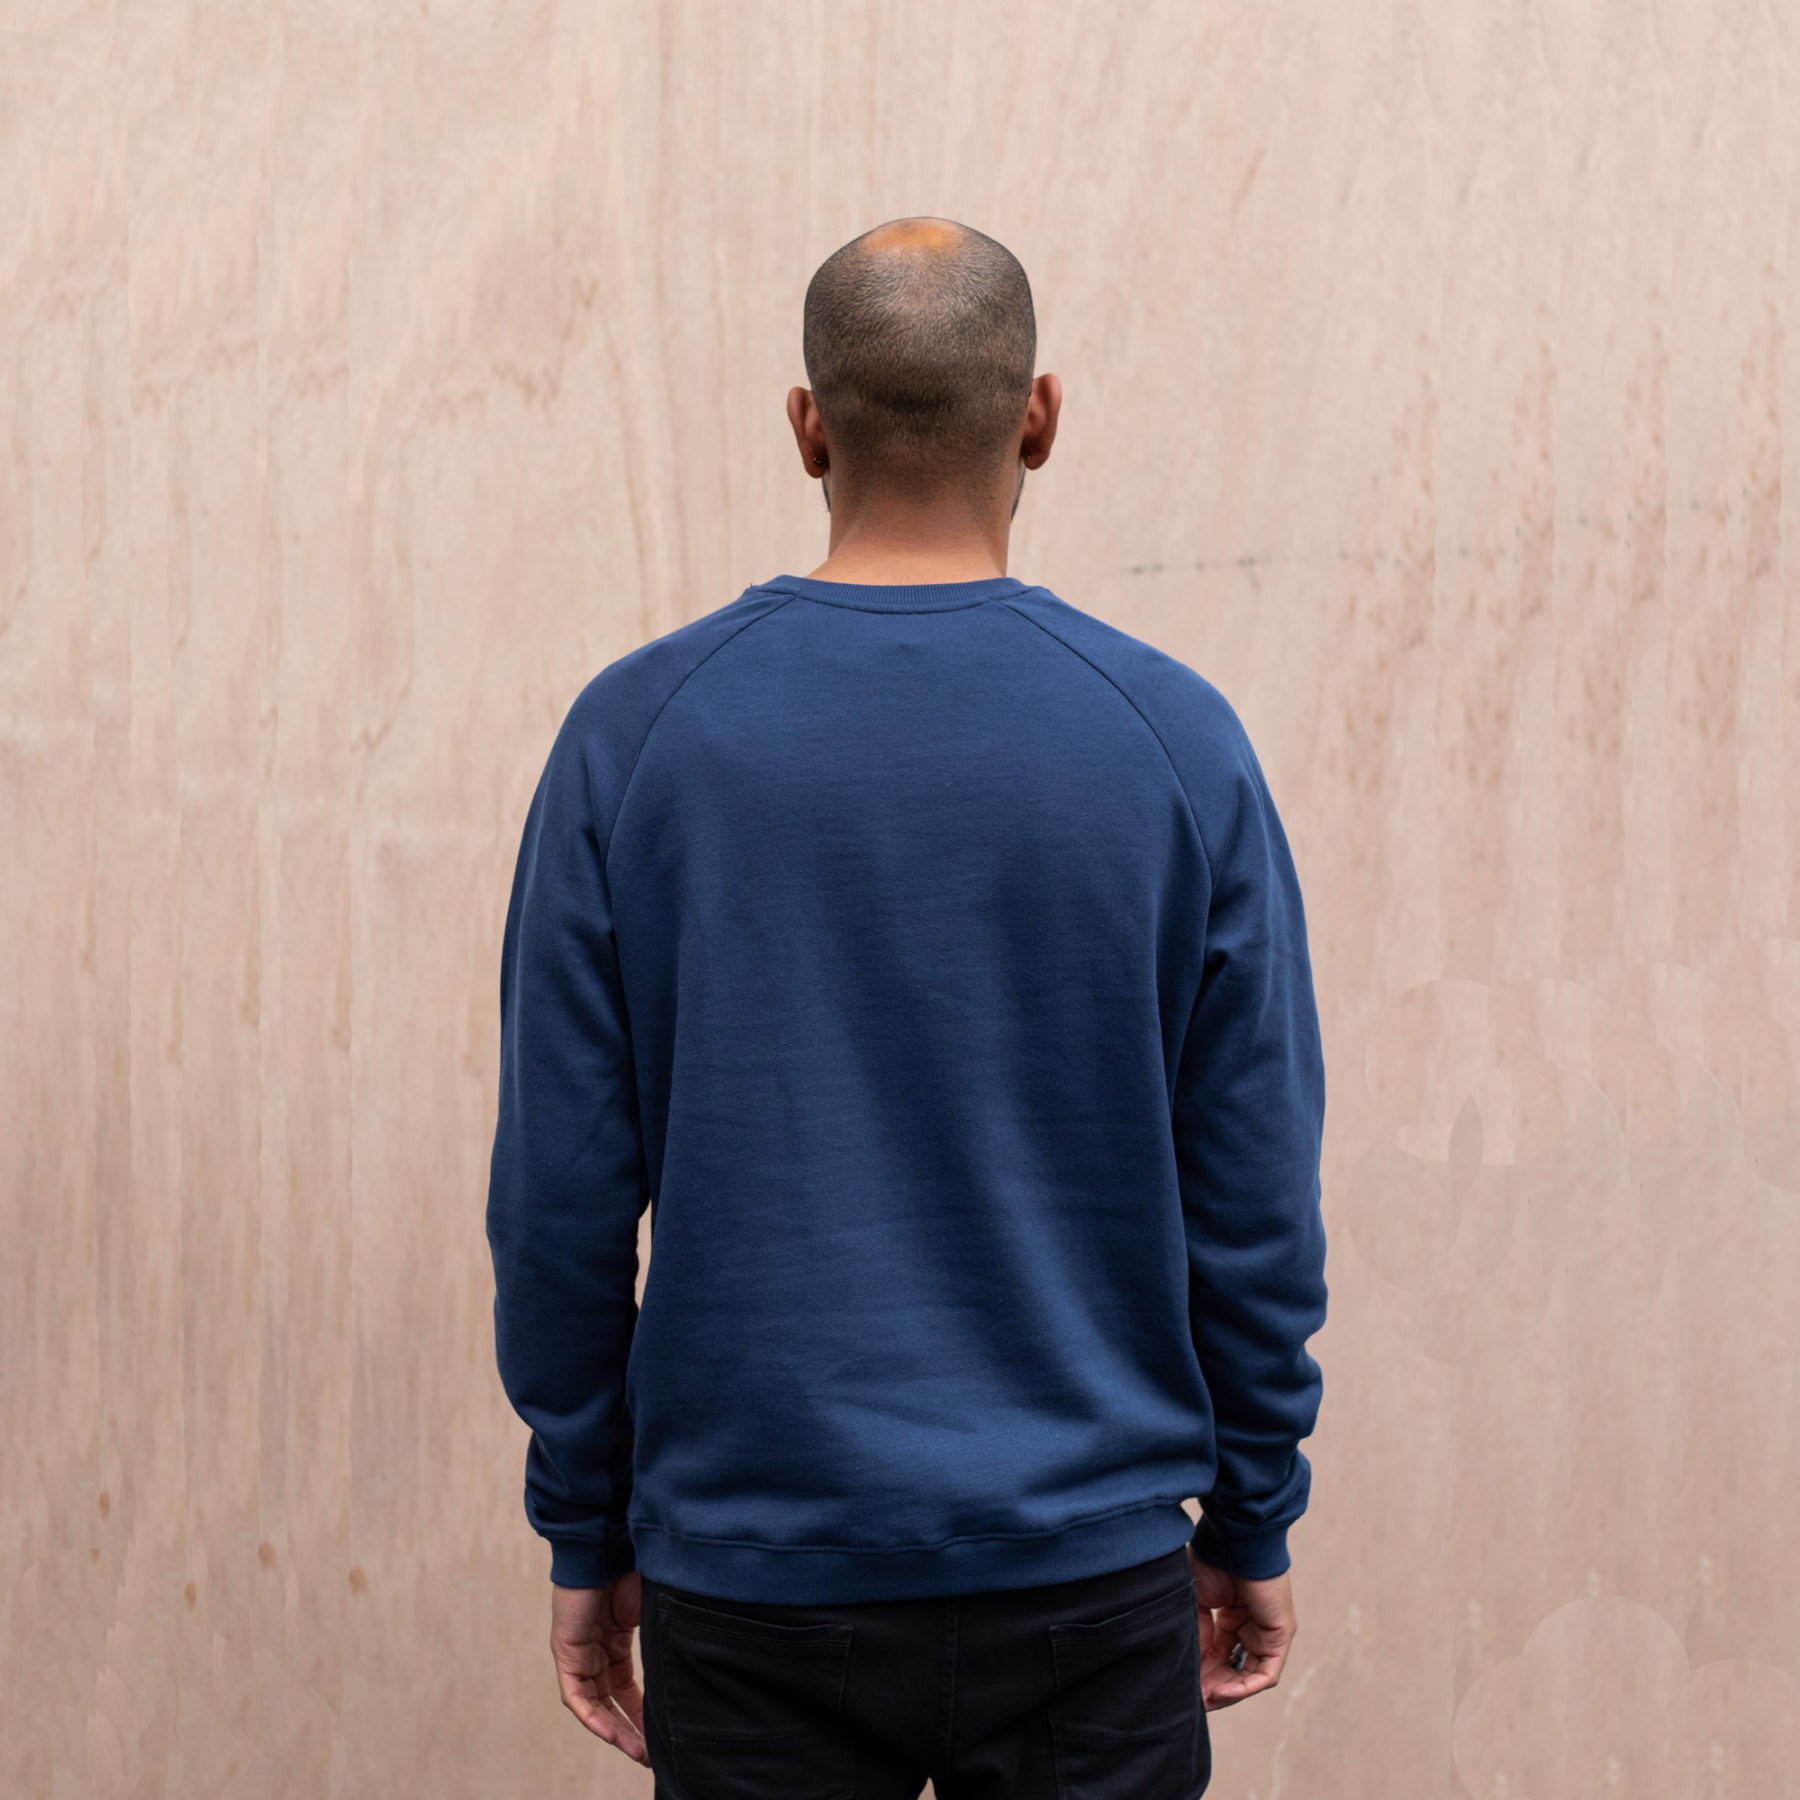 Simple Mountain organic sweater navy manes back.jpg